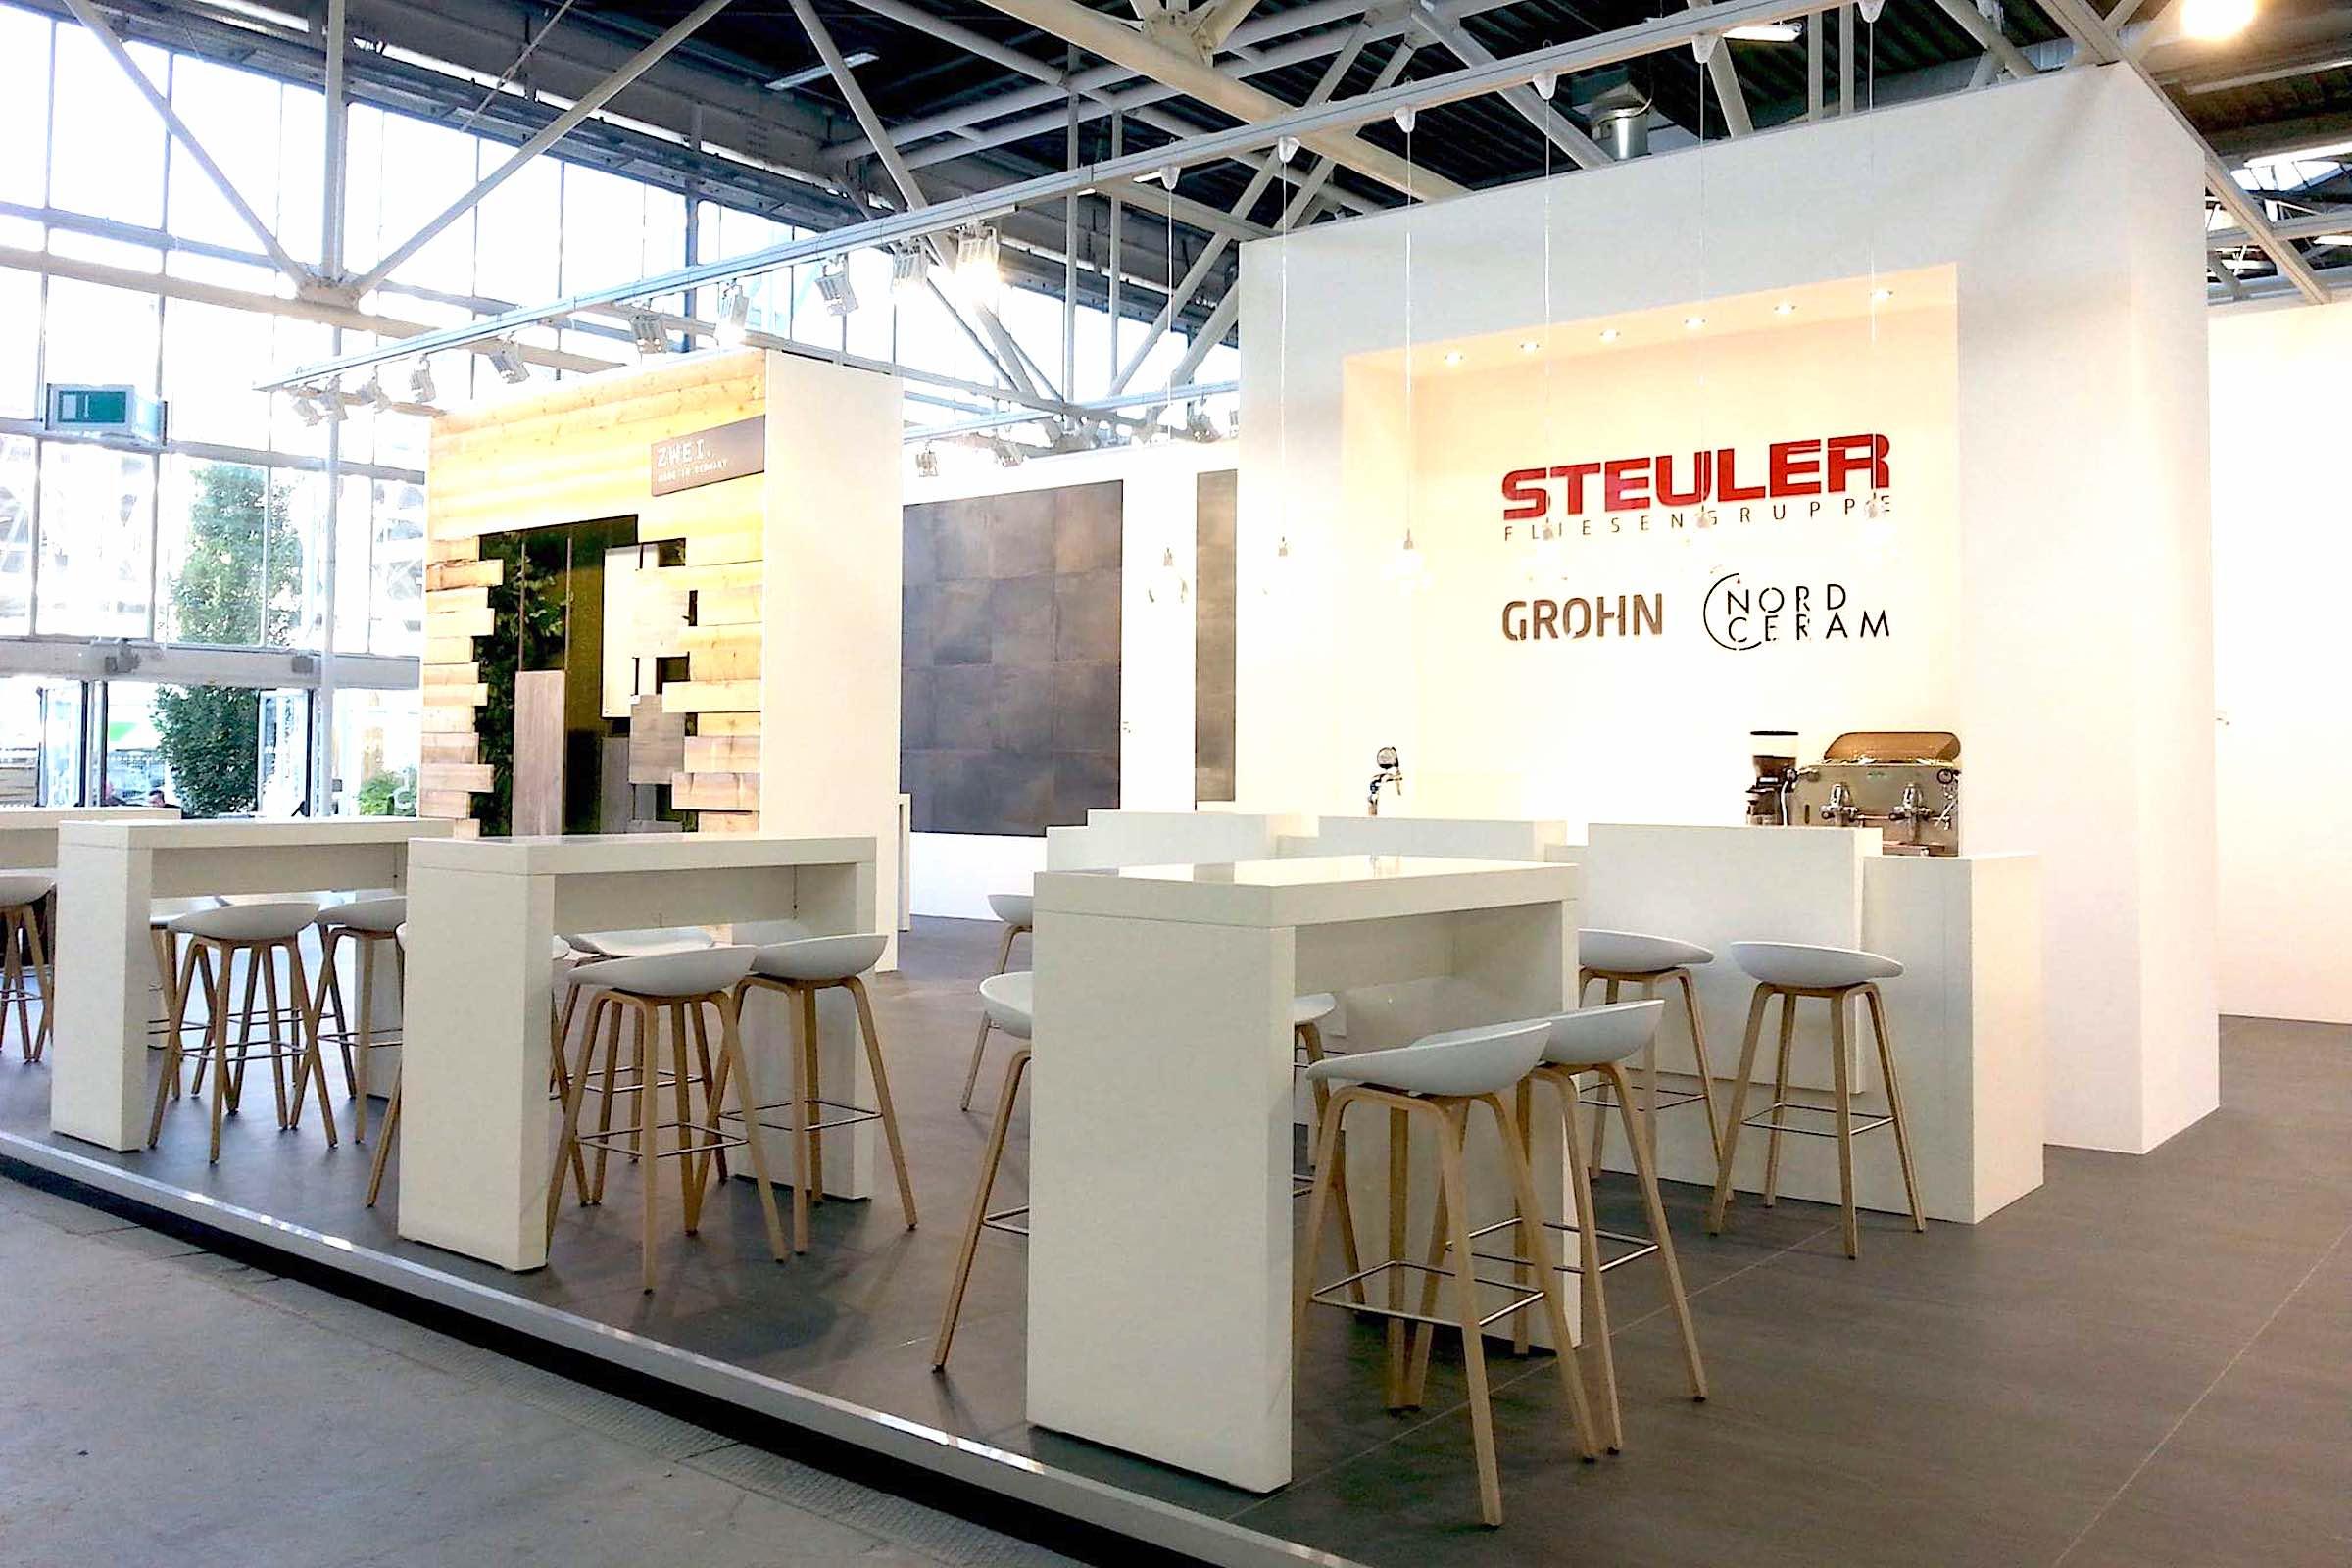 Messebau |Messestand |Standbau |Mietmöbel |Möbel |Mobiliar |Mieten |Hannover |Lehmann |Eventservice